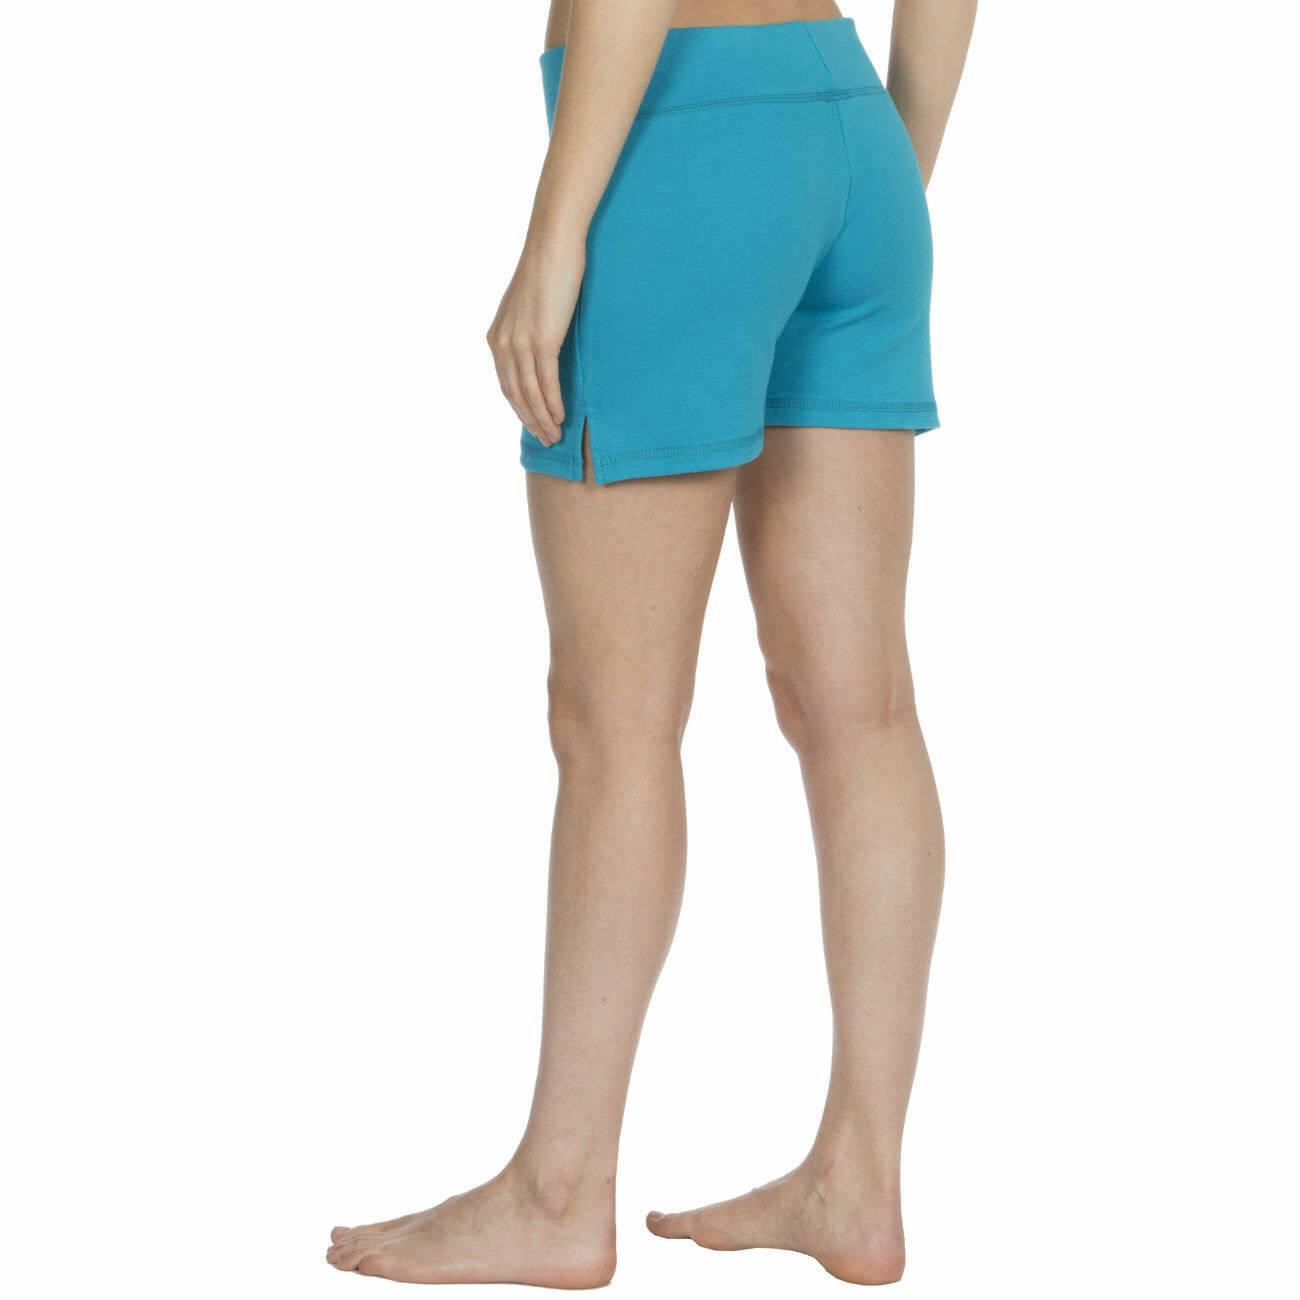 Womens-Cotton-Jersey-Shorts-Elastic-Waist-Summer-Beach-Casual-Yoga-Hot-Pants-New thumbnail 26